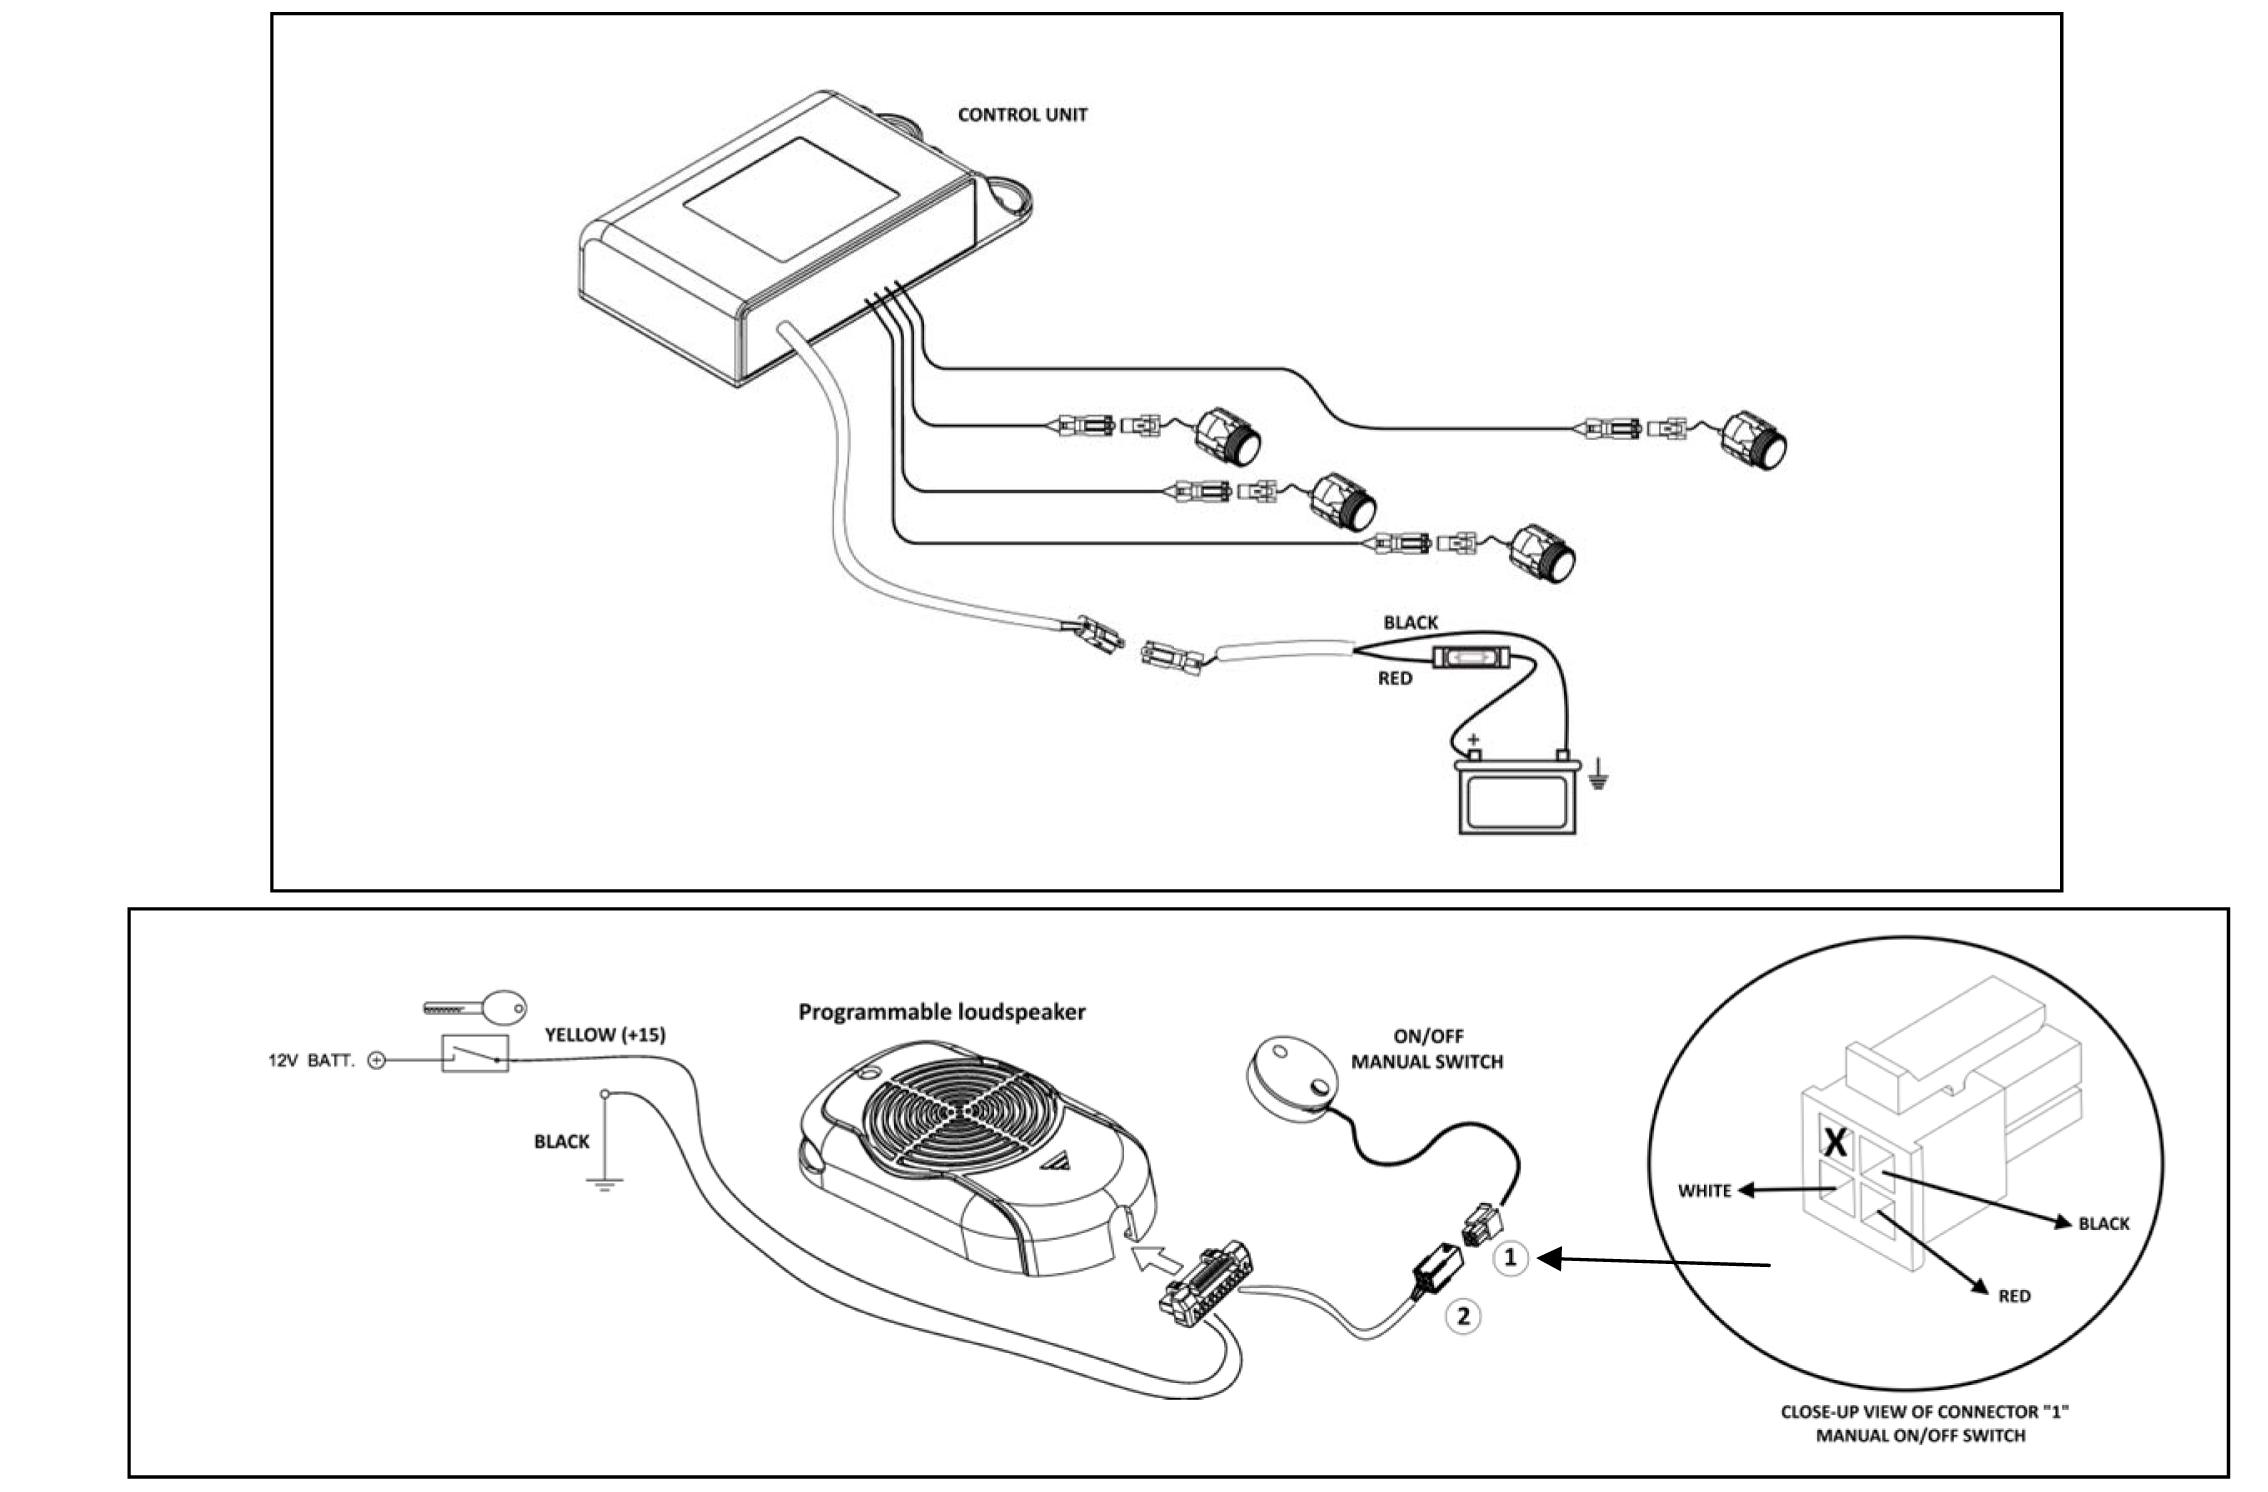 avs gemini 514fw wireless front parking sensor kit